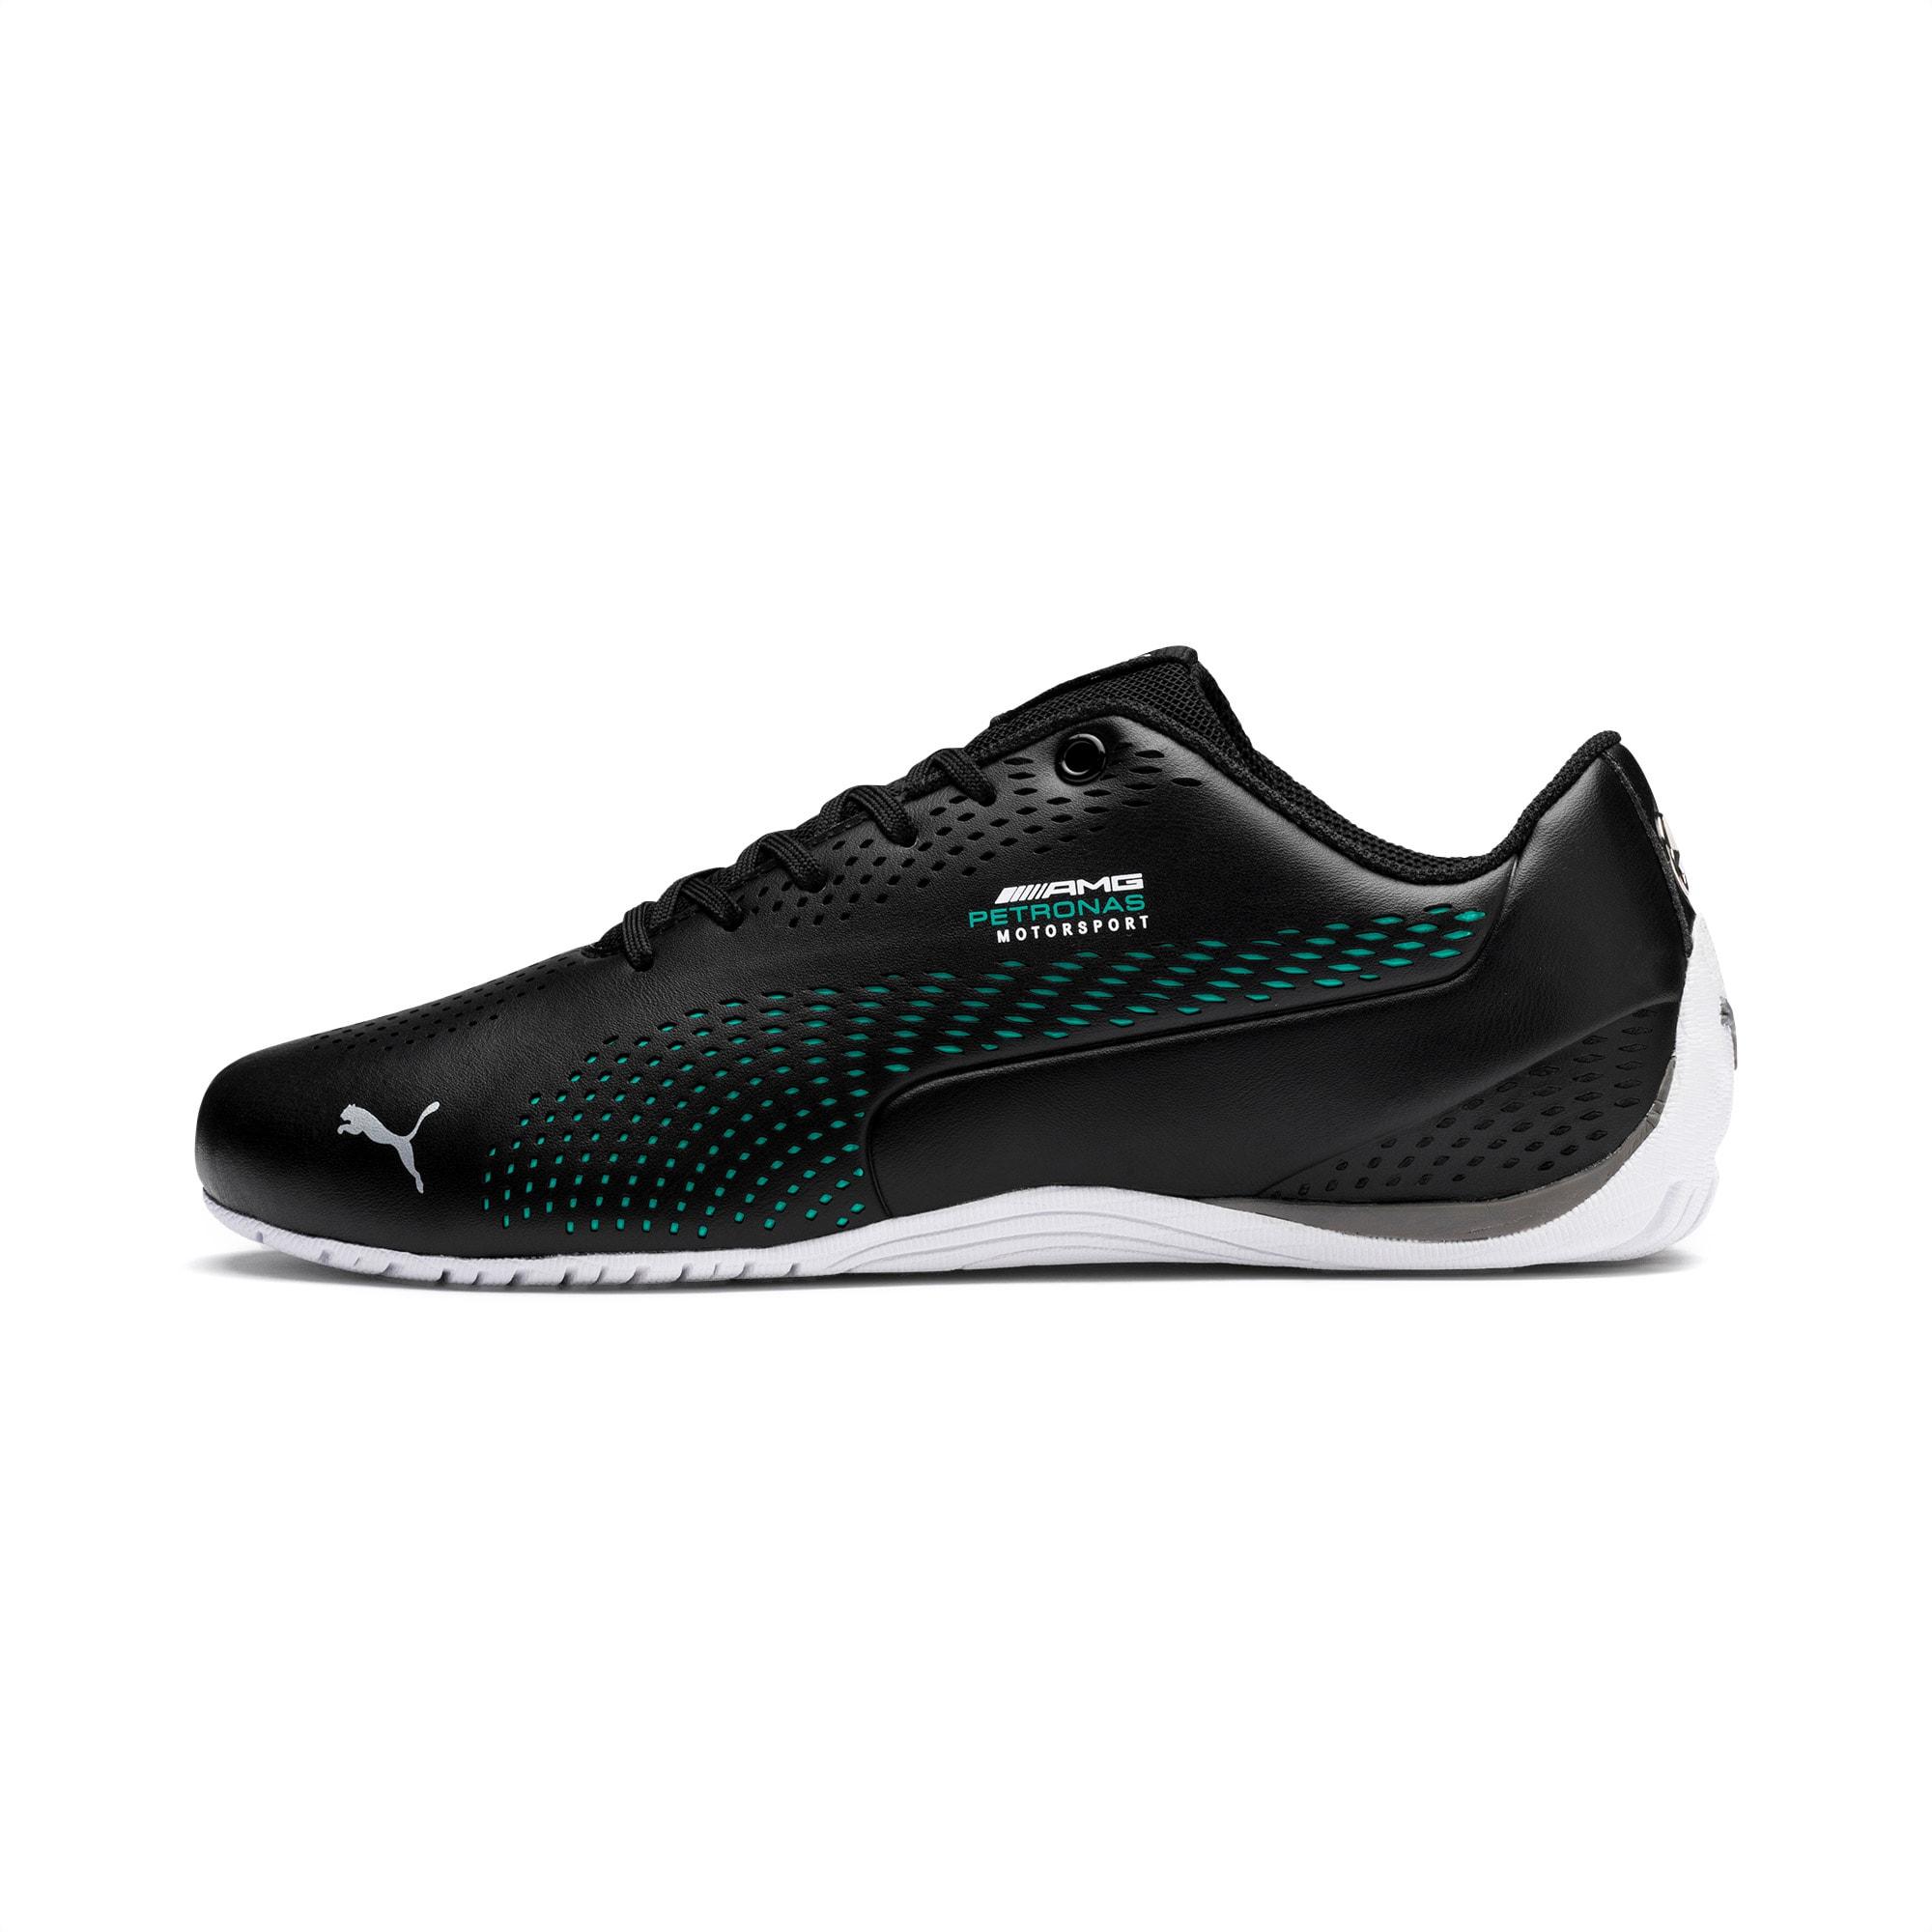 caravana Inclinarse Empresario  Mercedes AMG Petronas Drift Cat 5 Ultra II Shoes | Puma Black-Spectra Green  | PUMA Shoes | PUMA